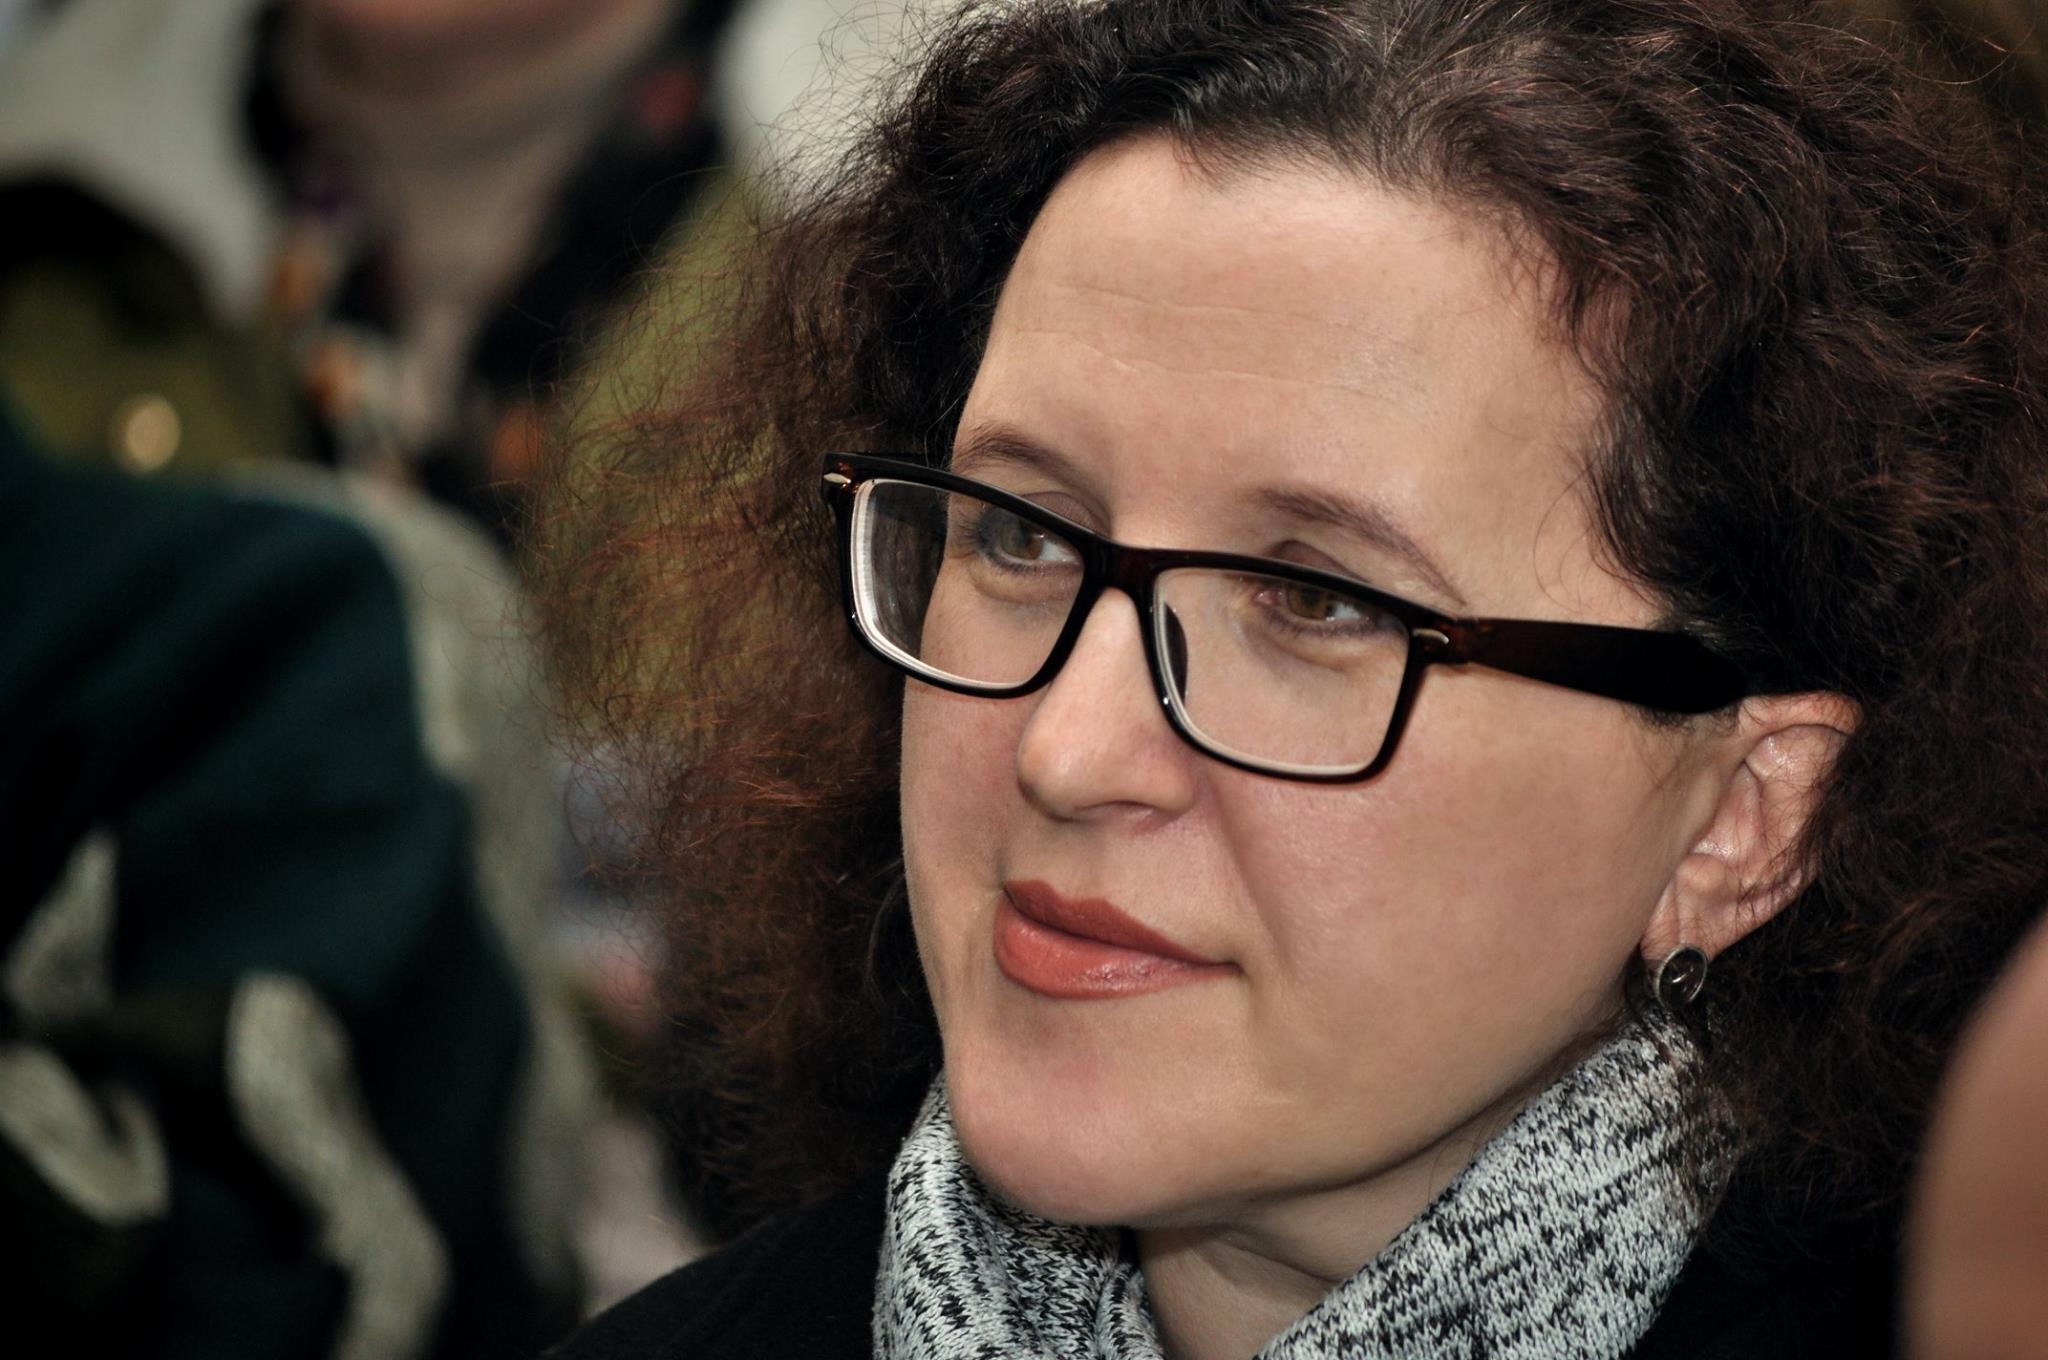 Ганна Черненко